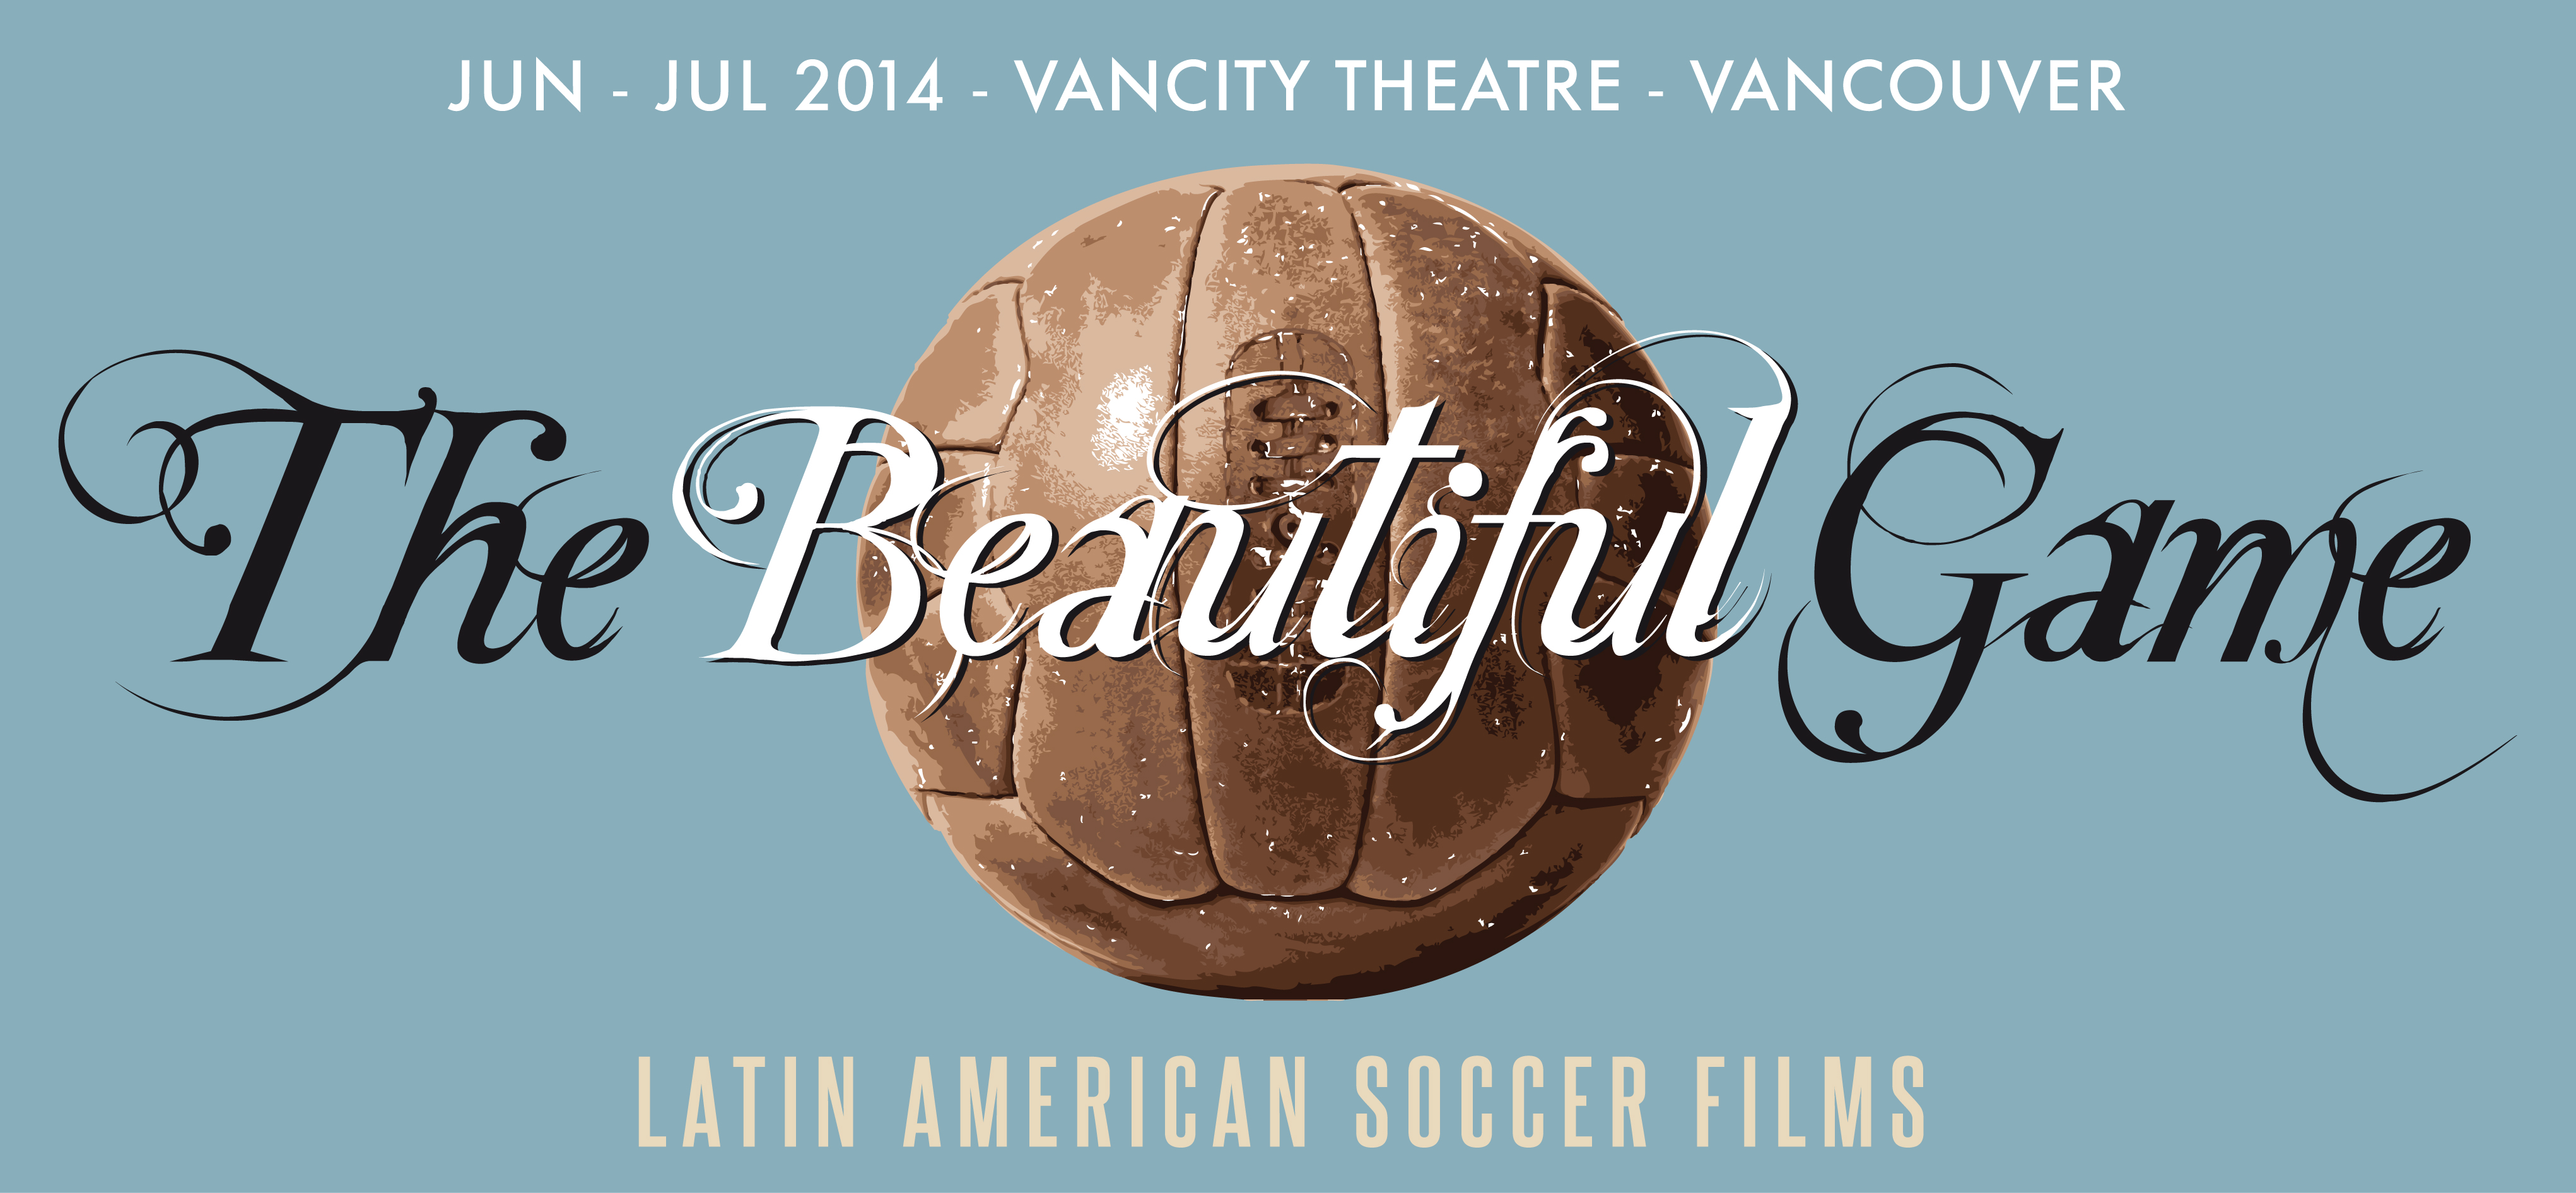 Latin American Soccer Films